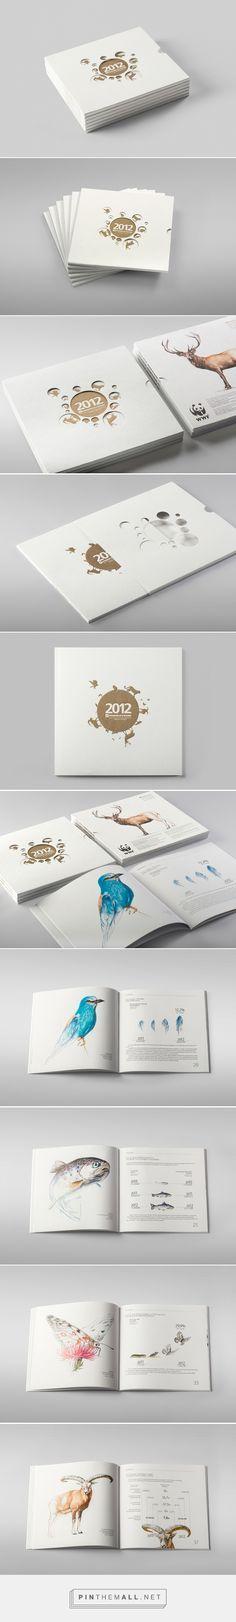 Prometey Bank Annual Report 2012 on Behance